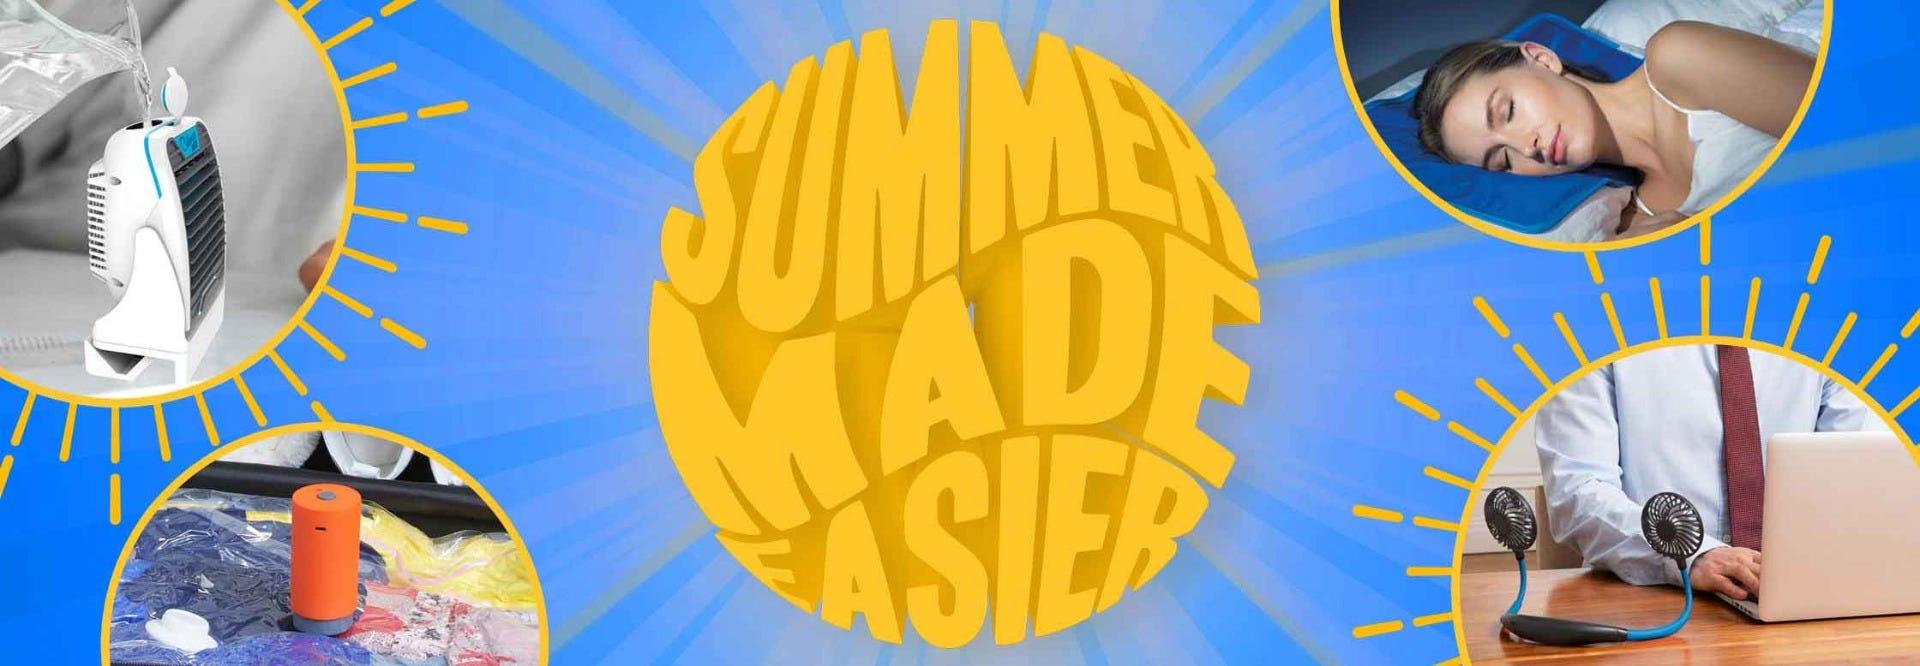 JML summer ready